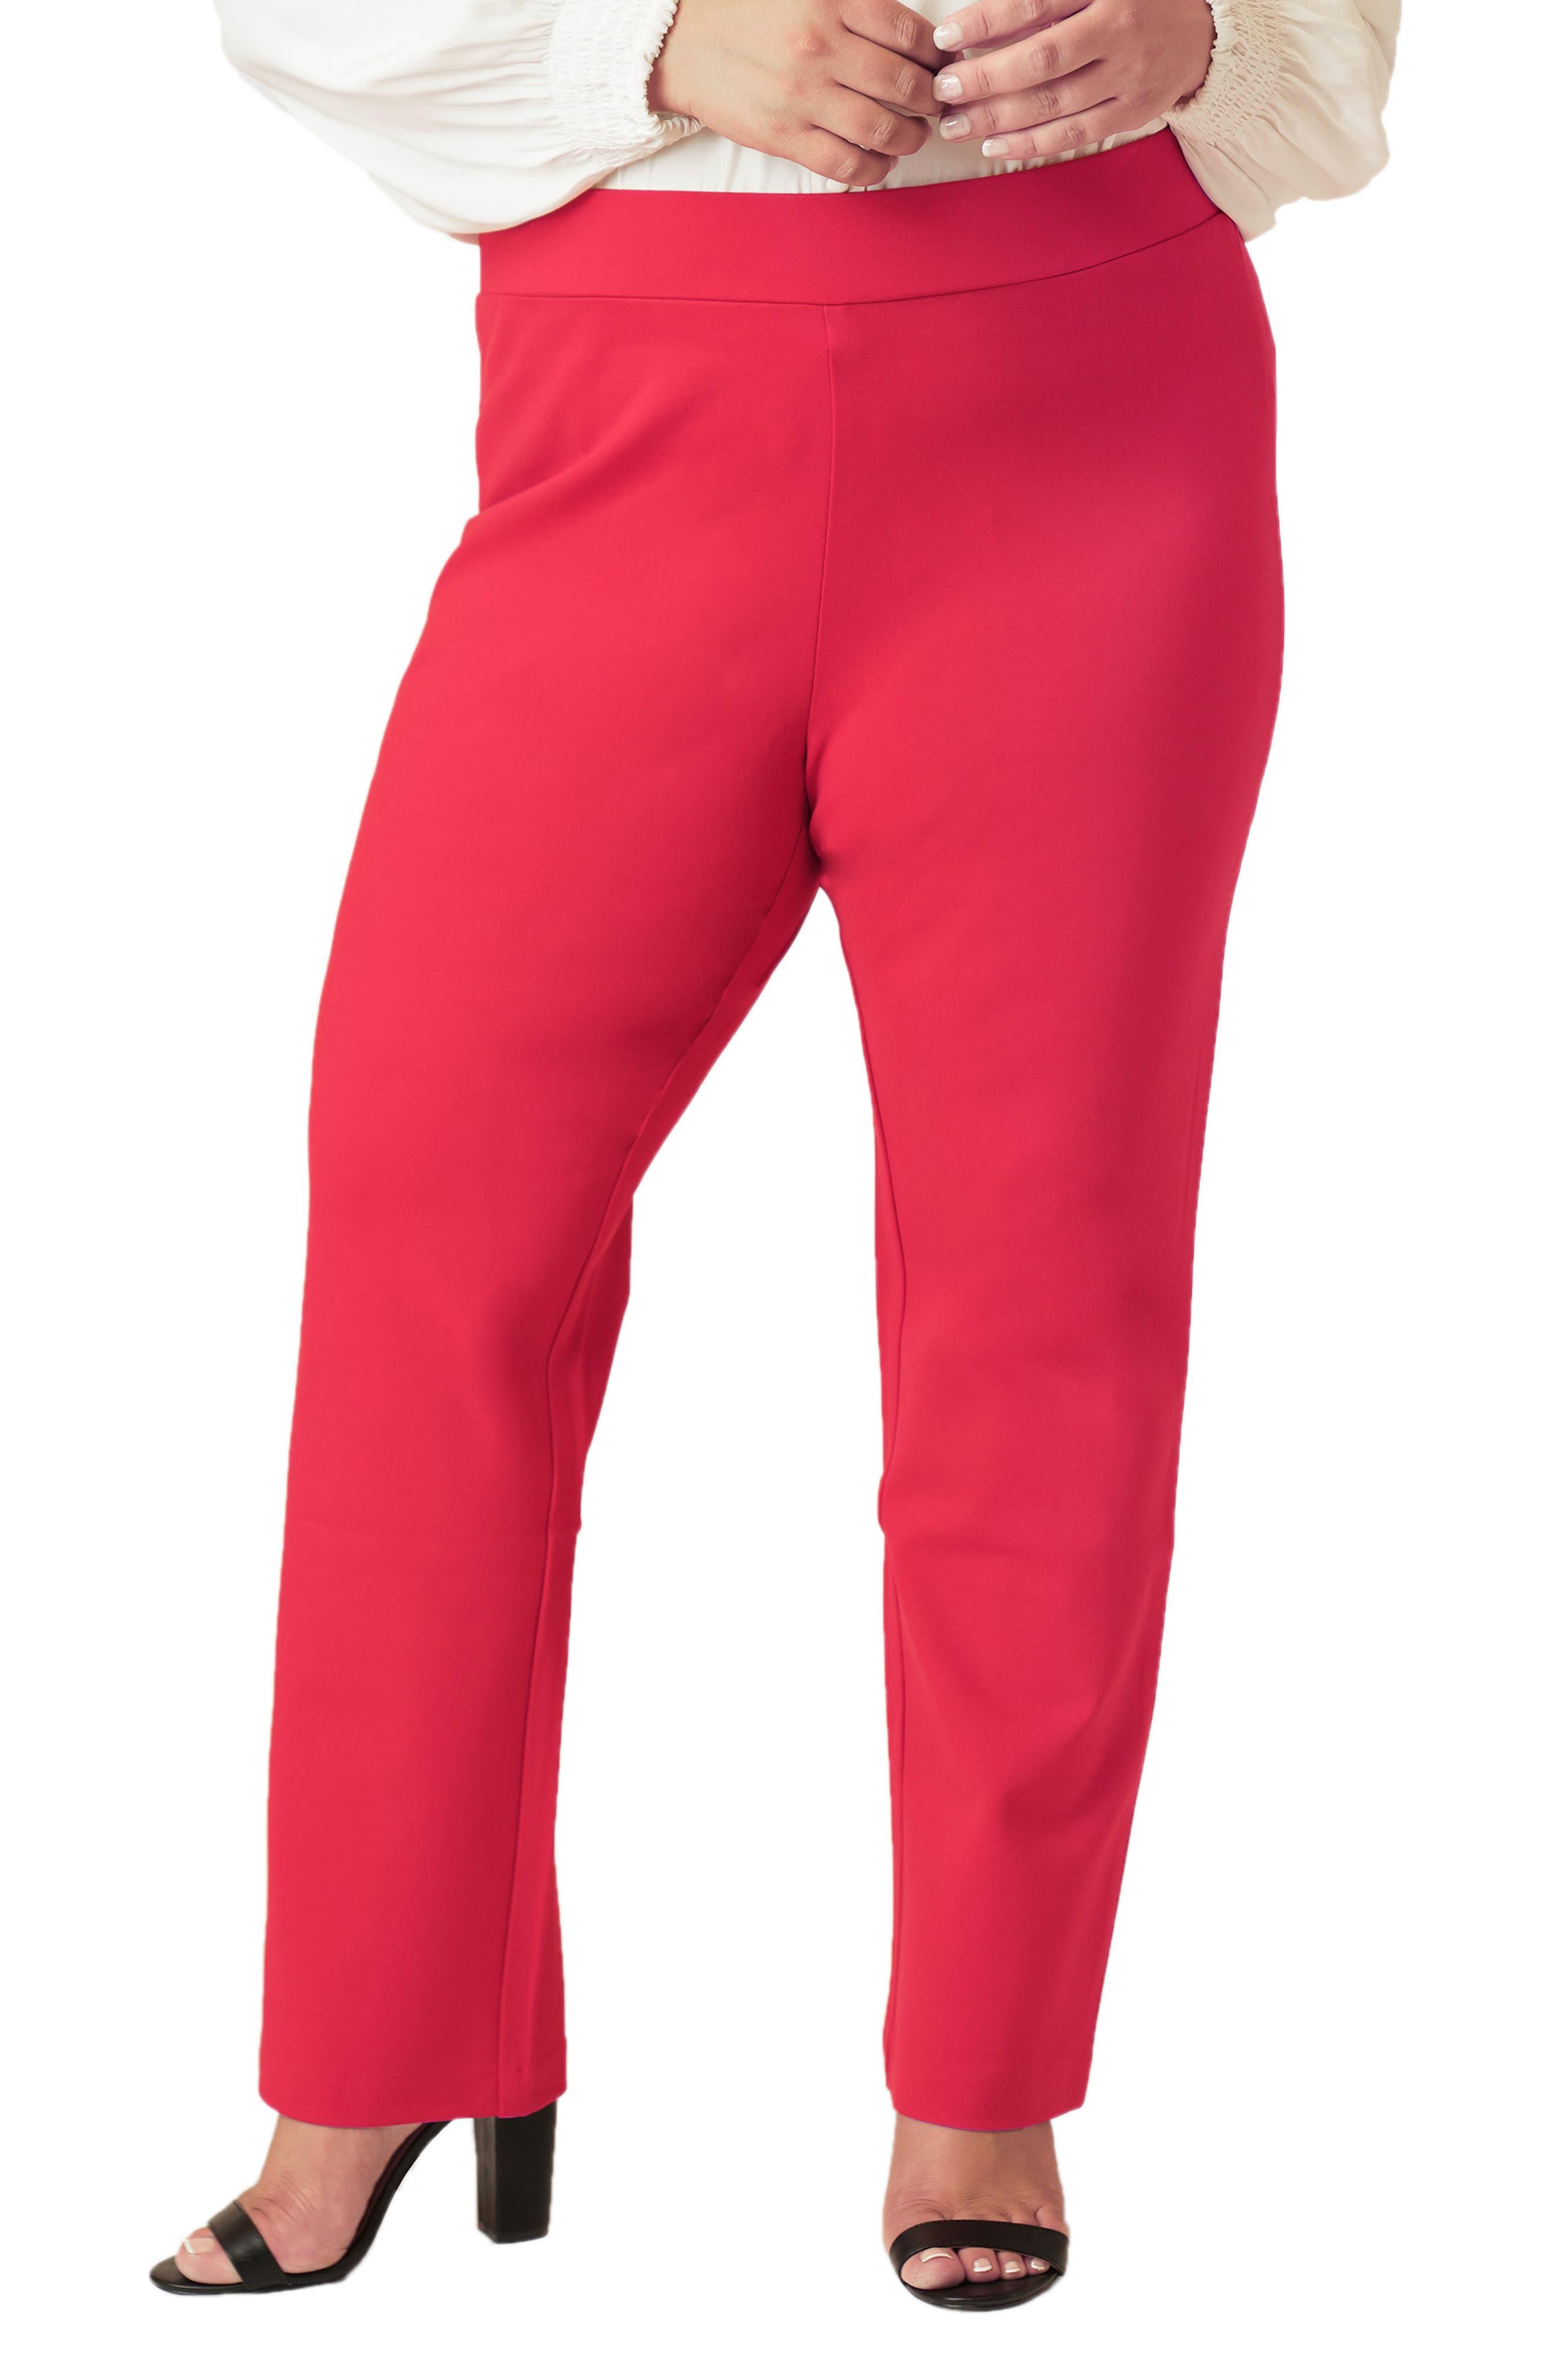 Straight Leg Compression Knit Pants